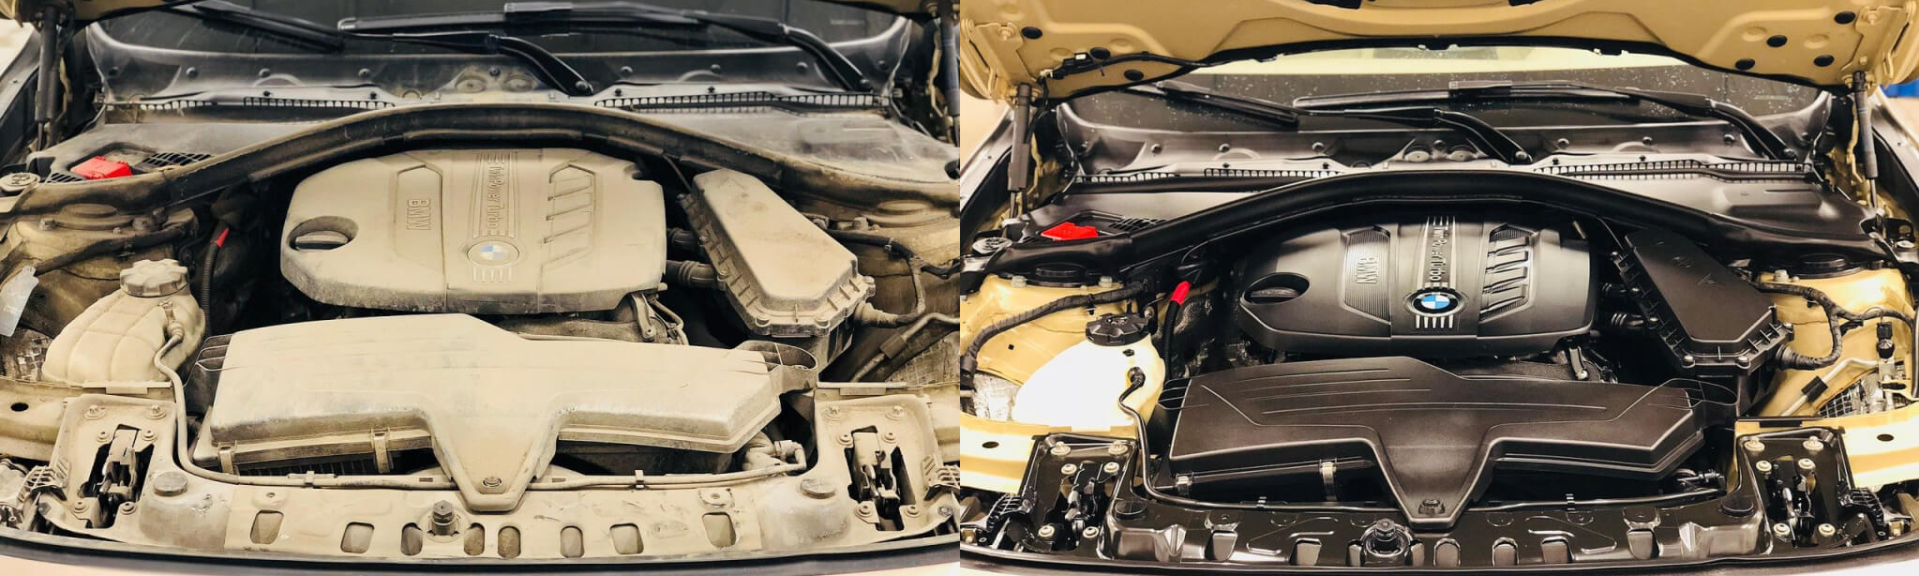 Мойка двигателя грузового автомобиля